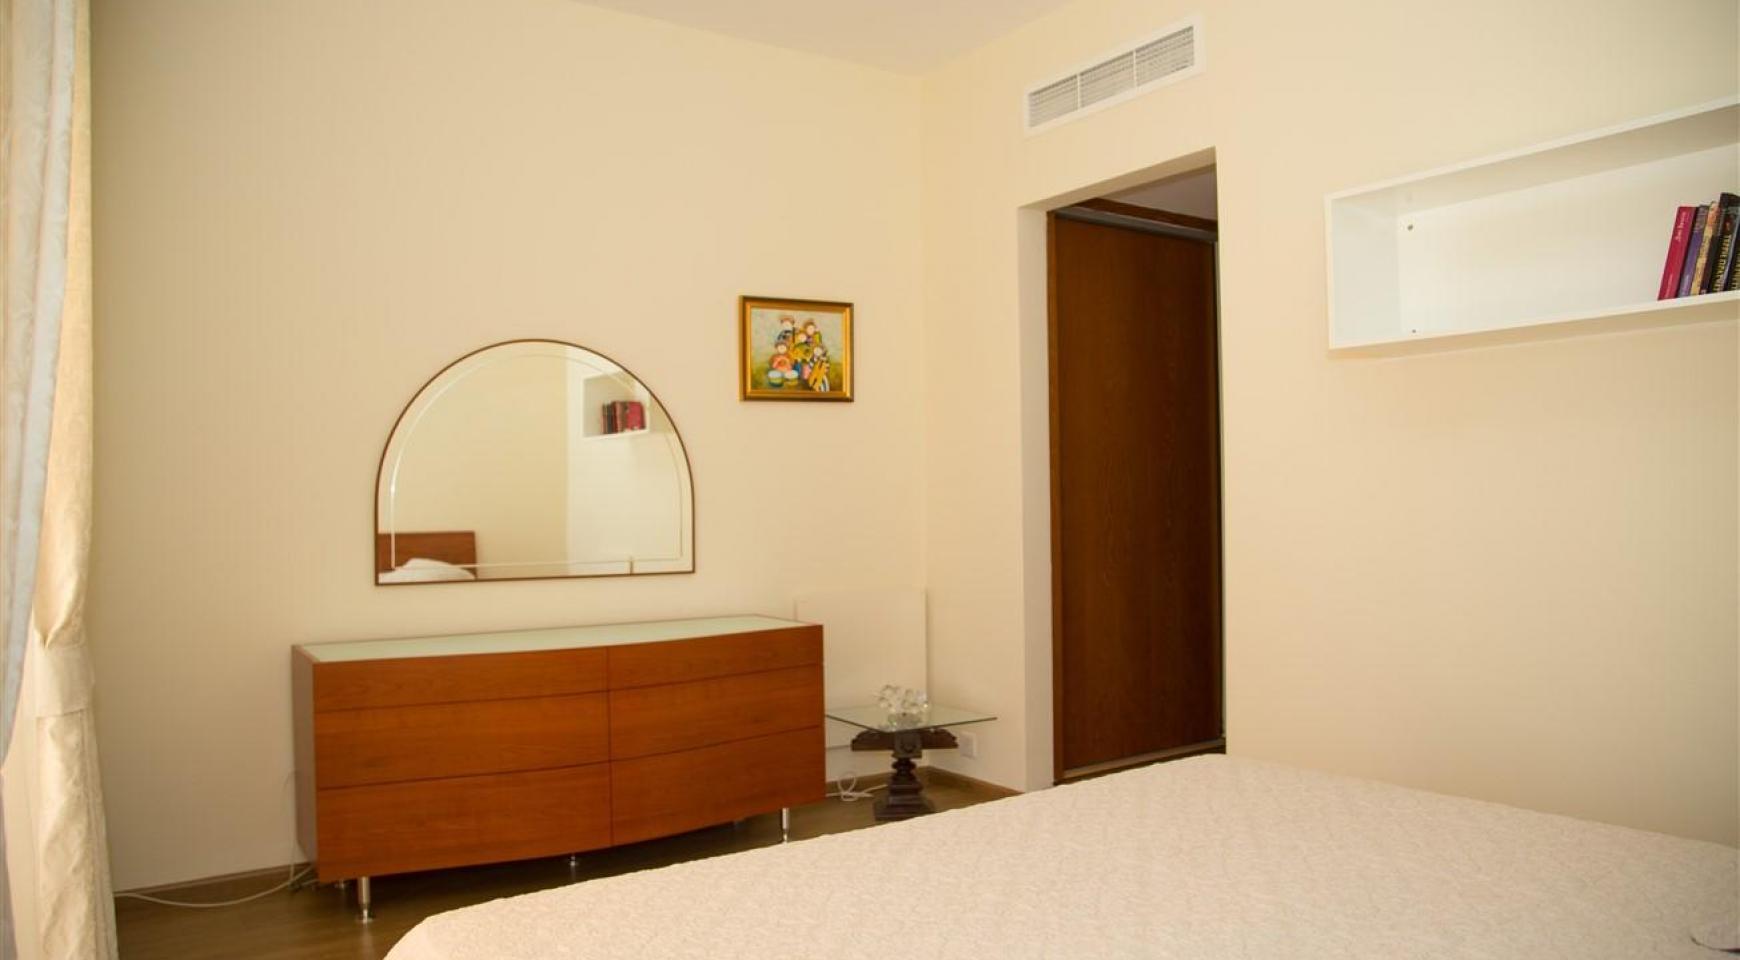 3-Спальная Квартира на Берегу Моря в Комплексе Thera   - 11